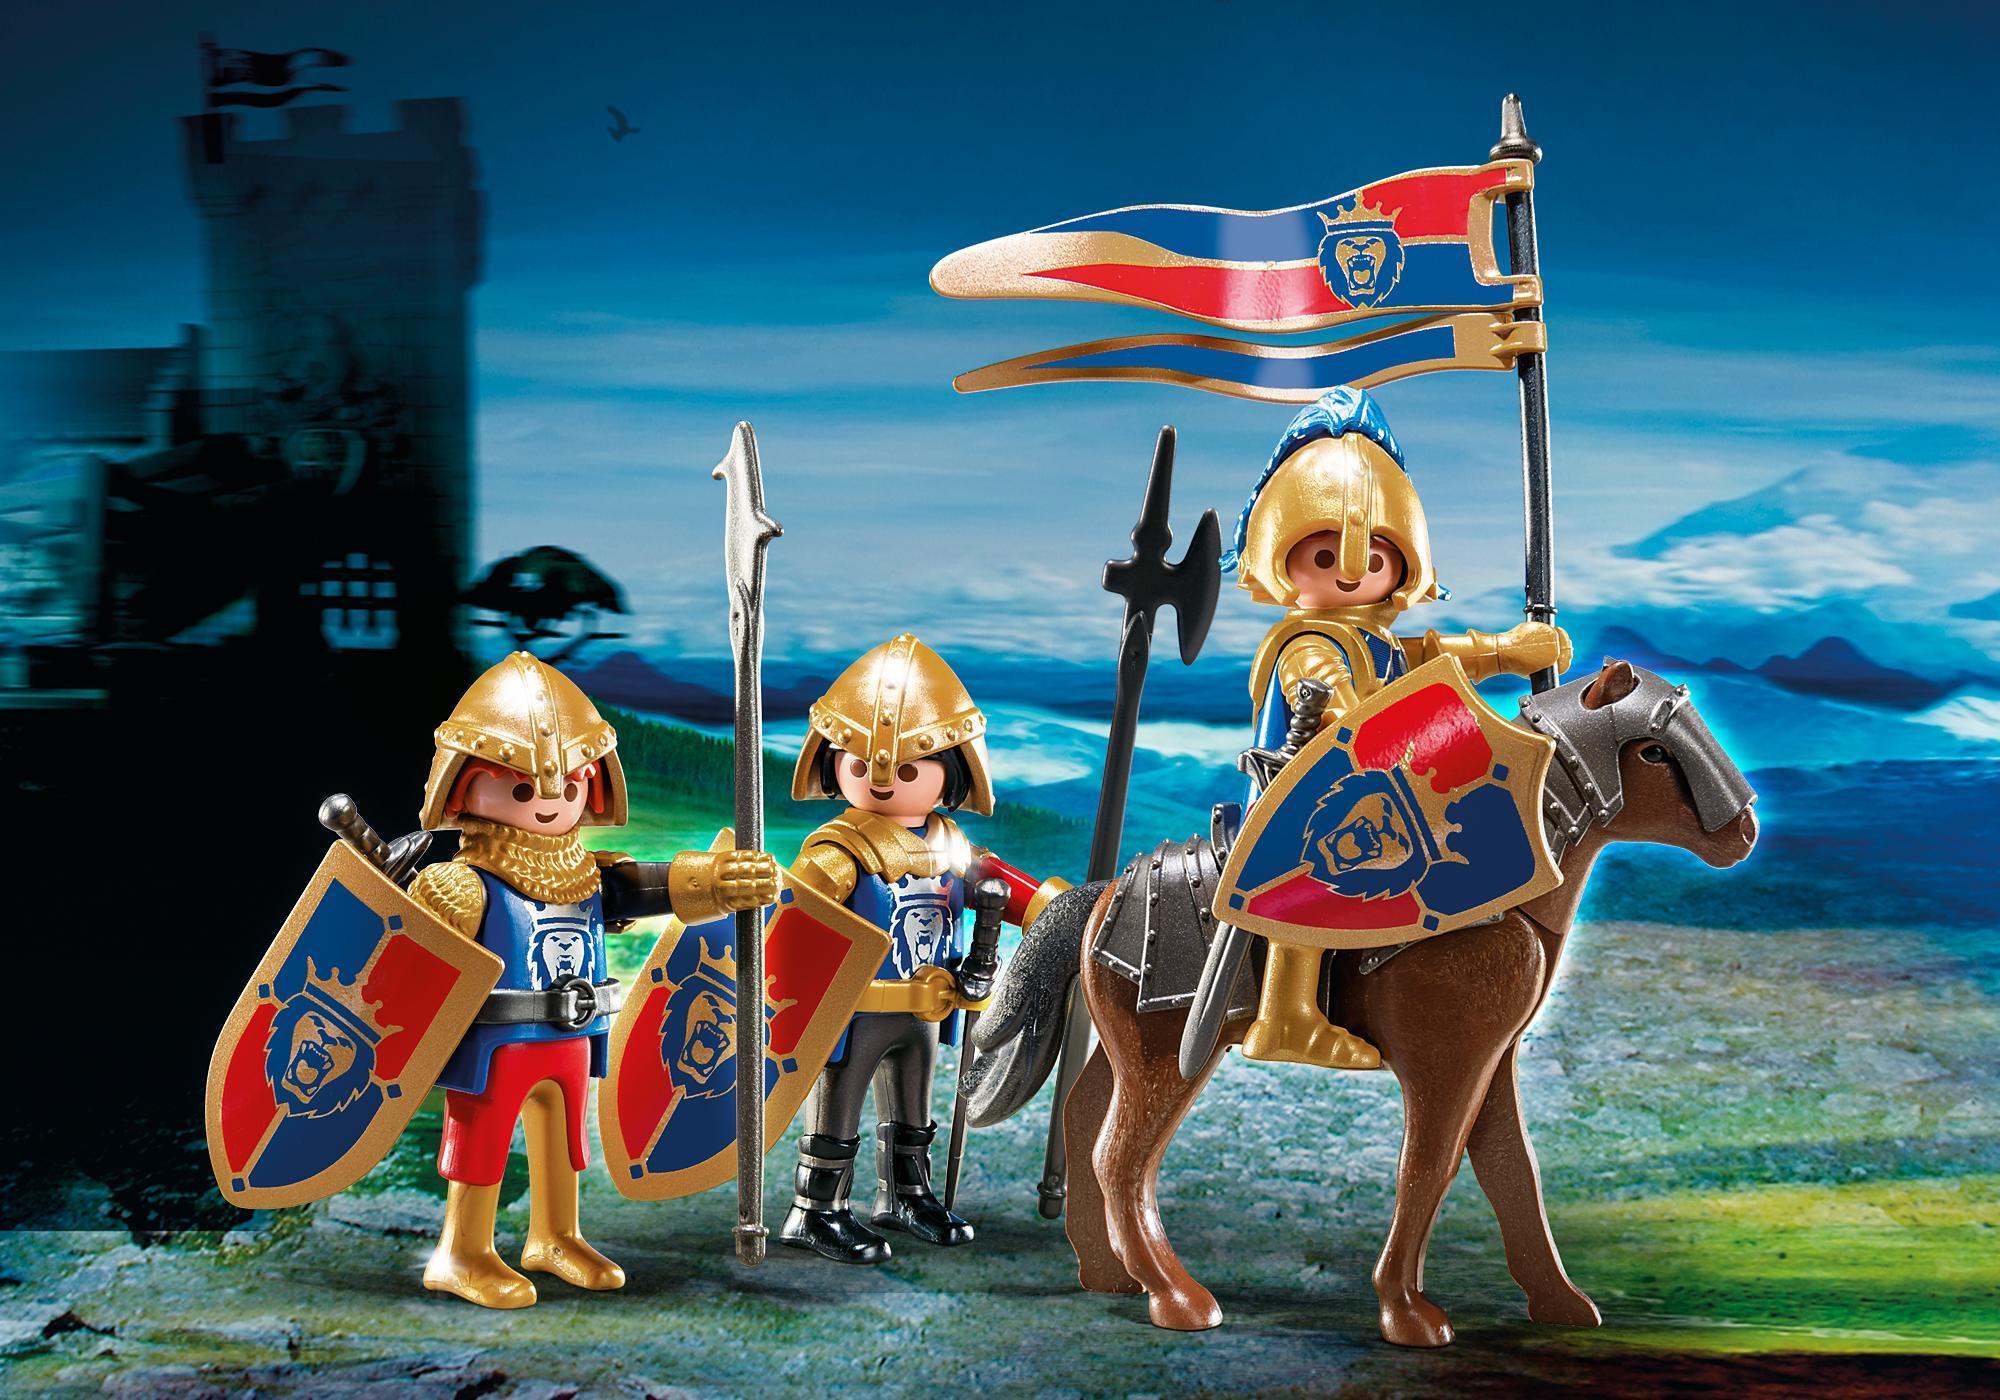 http://media.playmobil.com/i/playmobil/6006_product_detail/Chevaliers du Lion Impérial